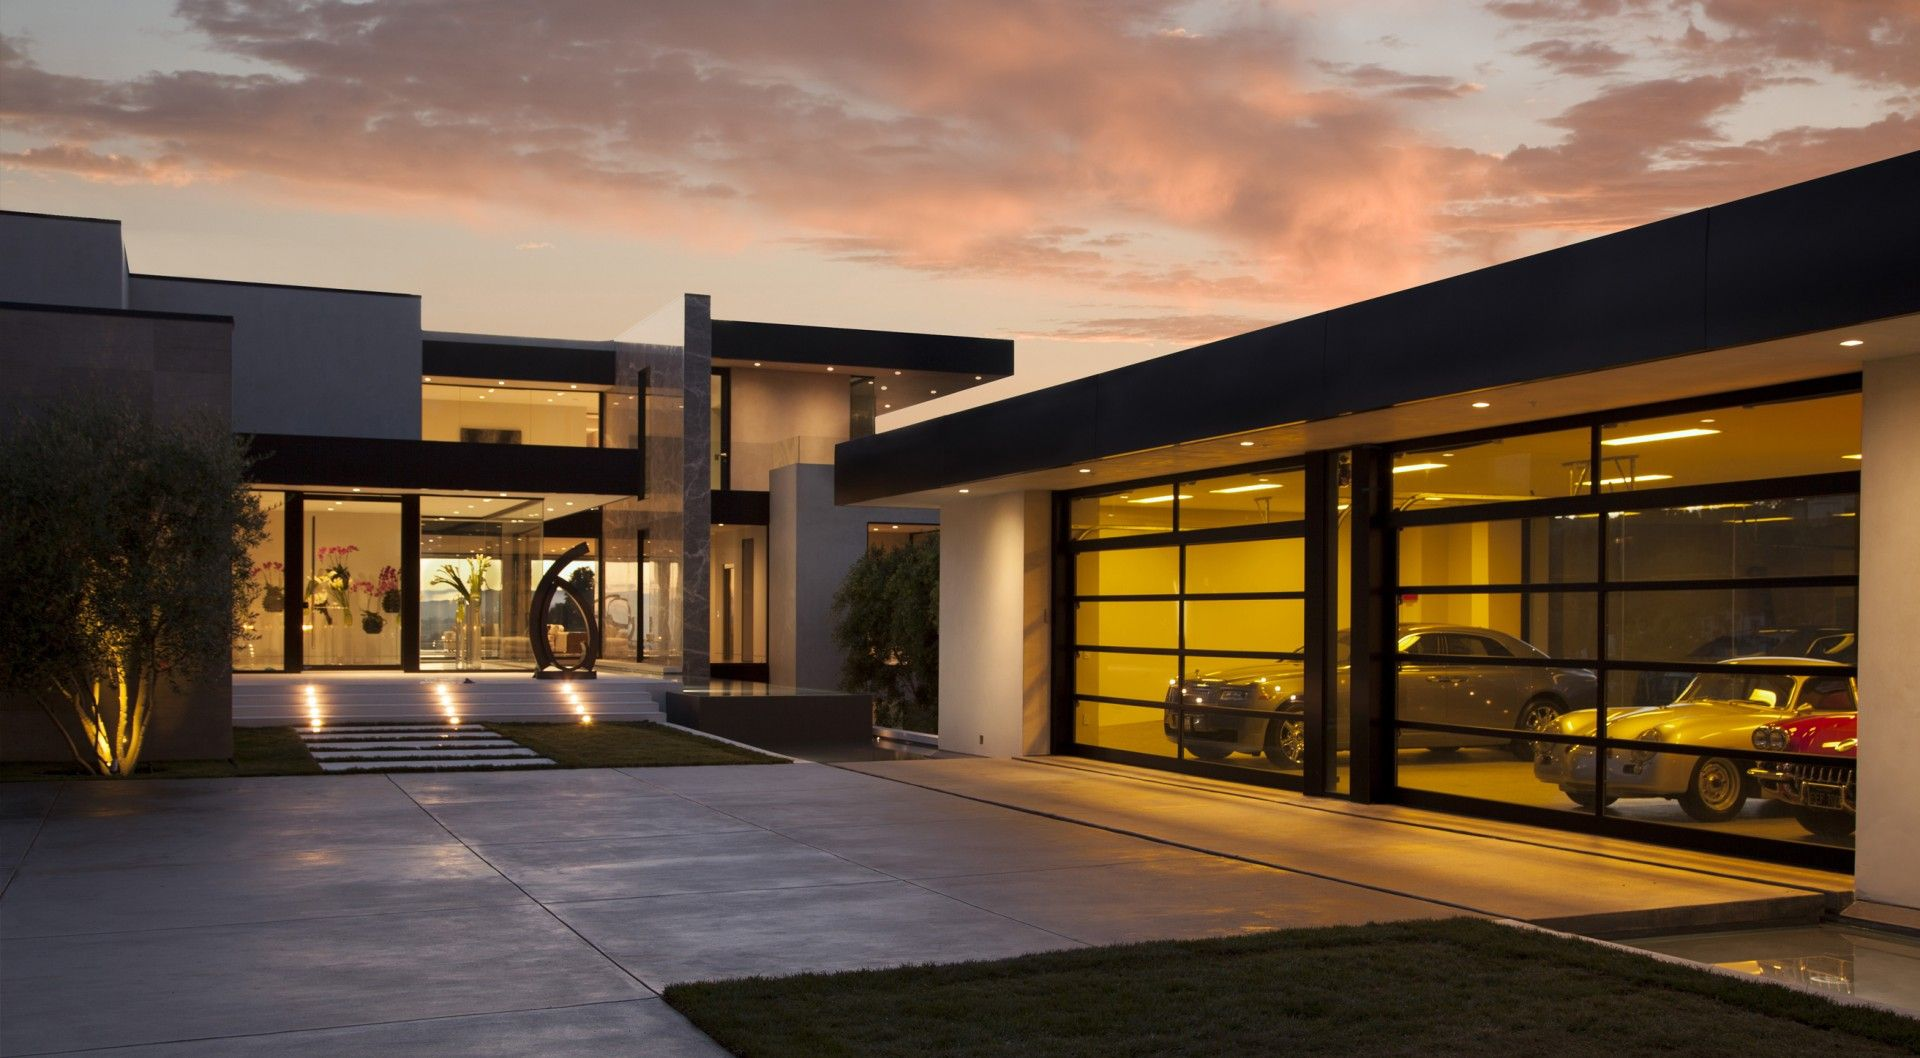 Los Angeles, Laguna Beach Architecture Projects   McClean Design ...